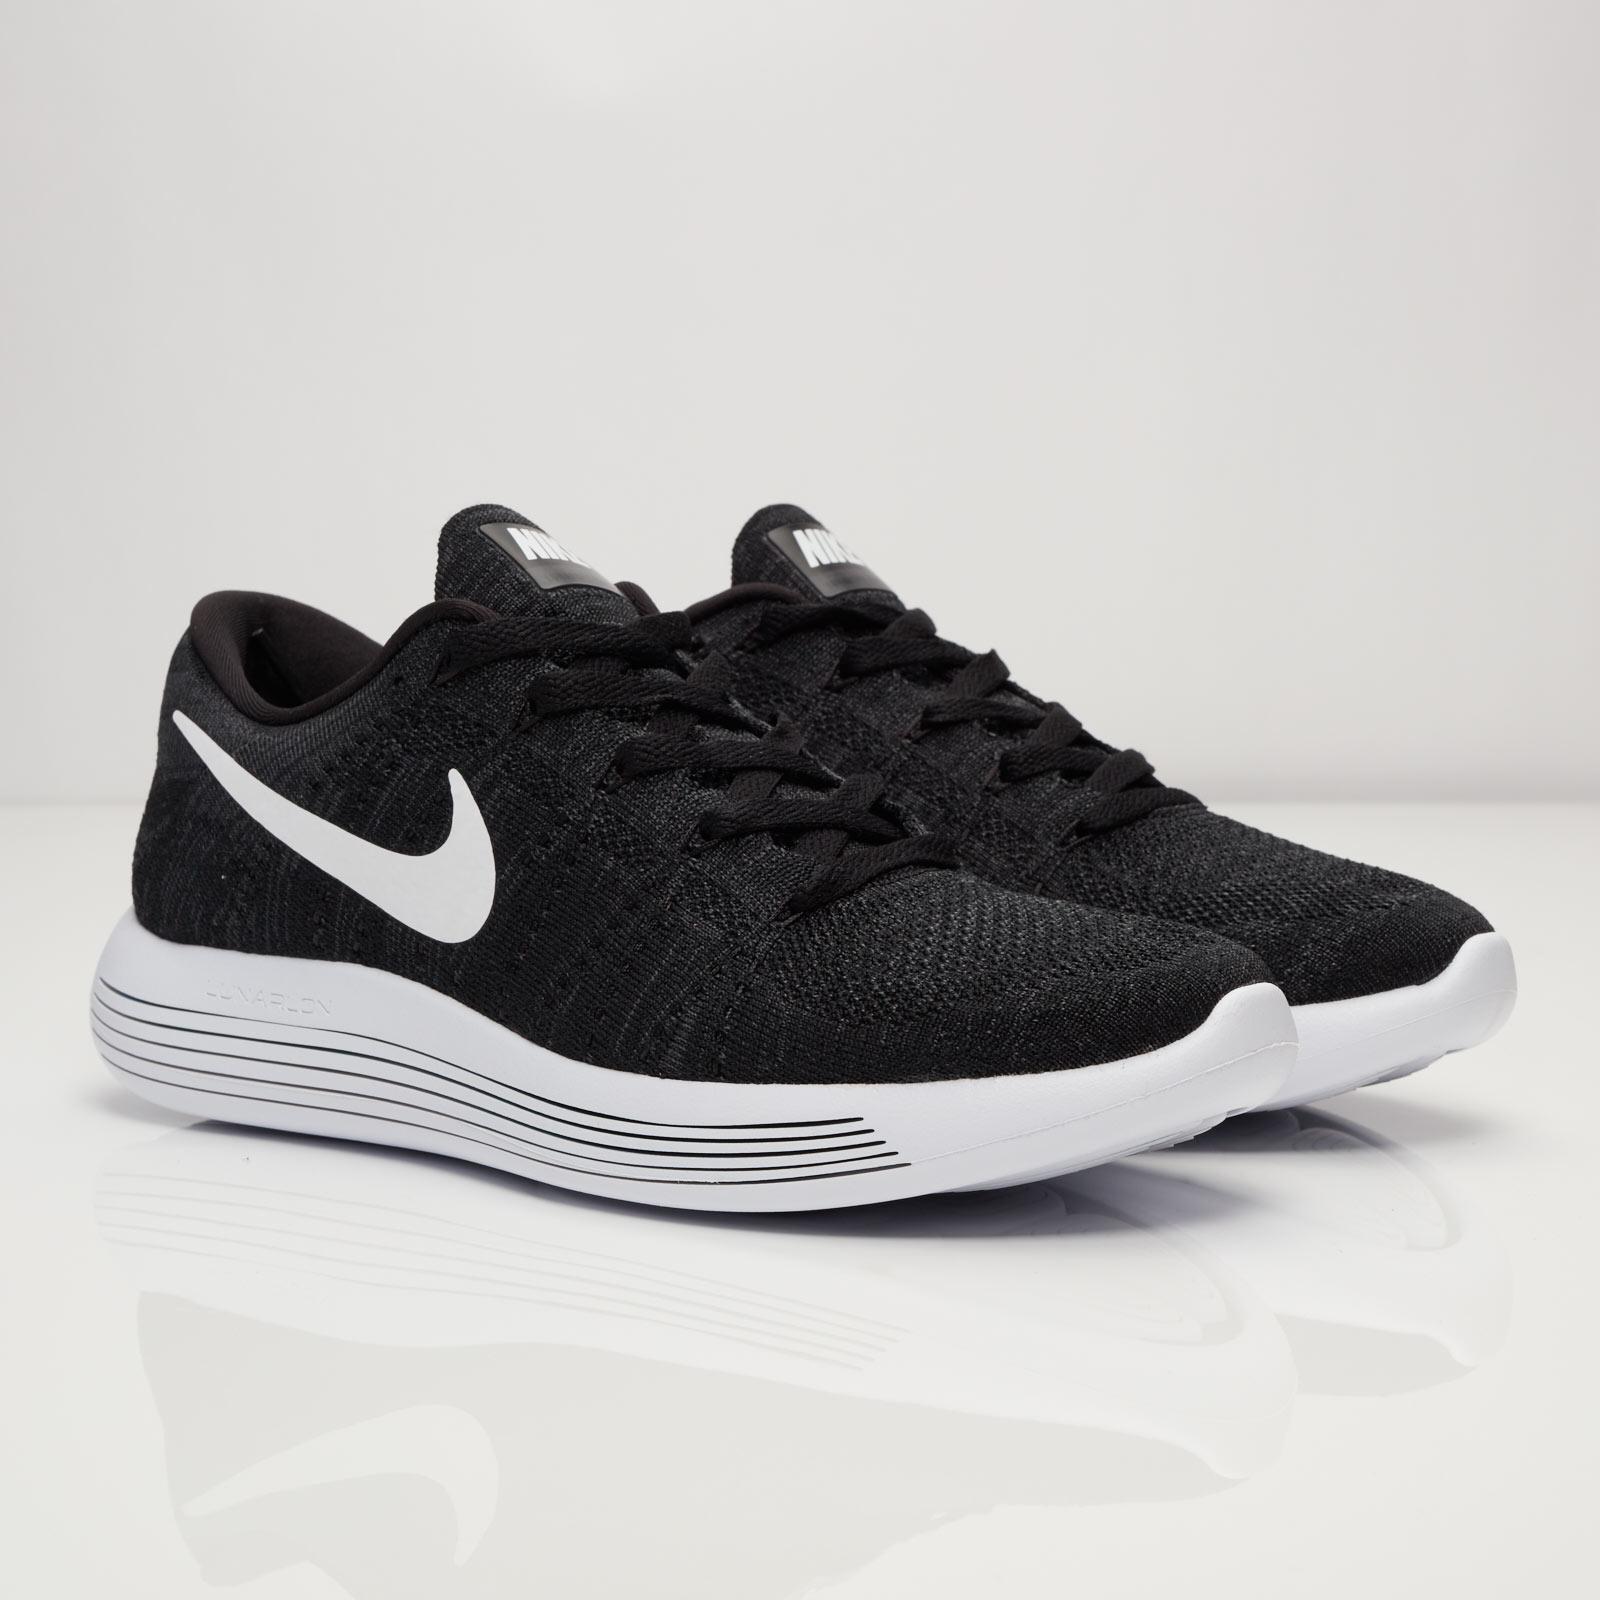 factory price 24719 e1937 Nike Lunarepic Low Flyknit